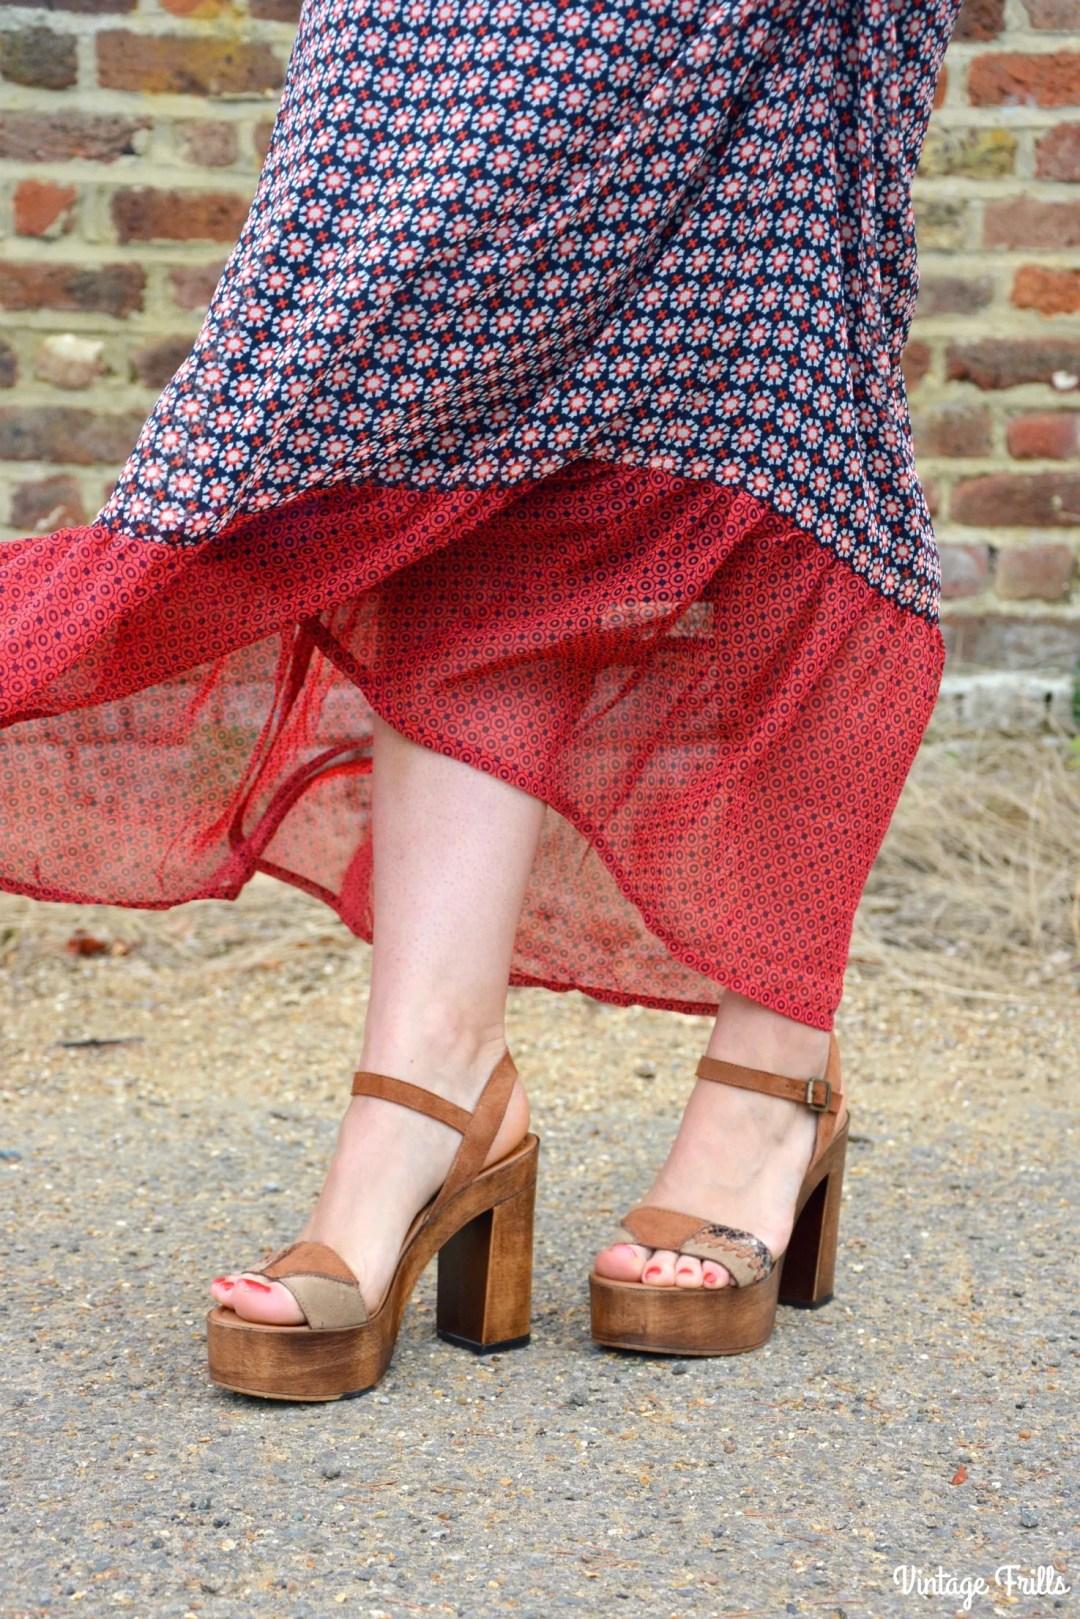 JD Williams 70s Style Platform Sandals